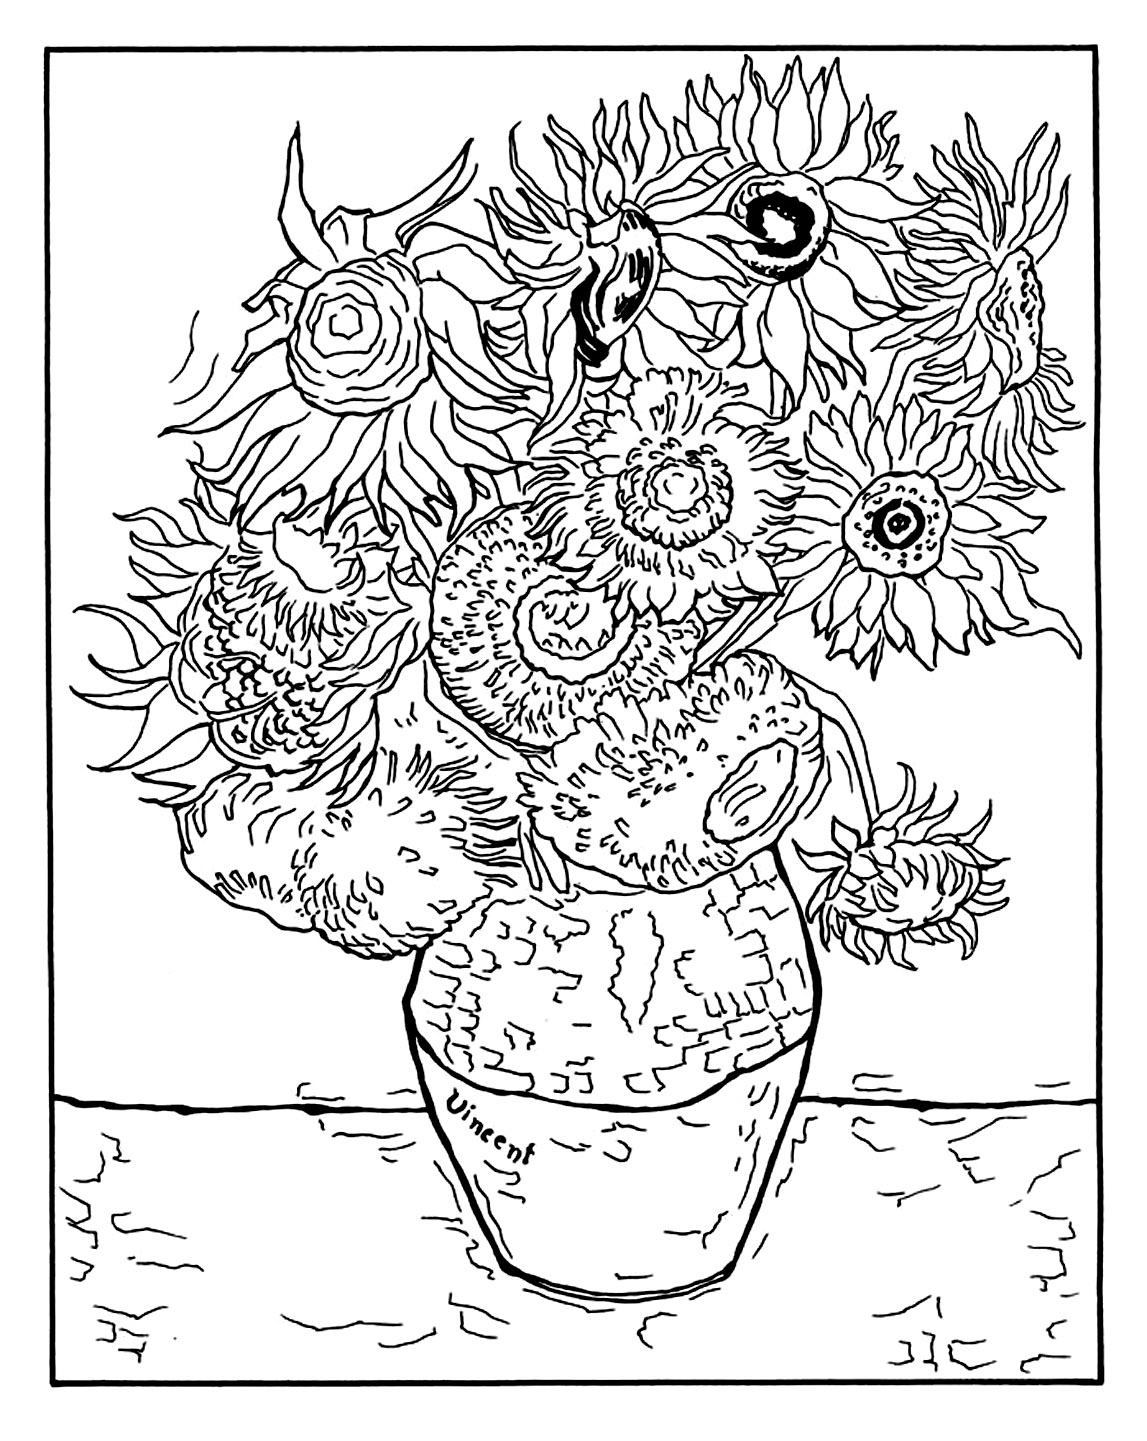 Vincent van gogh 12 tournesols dans un vase chefs d - Coloriage van gogh ...